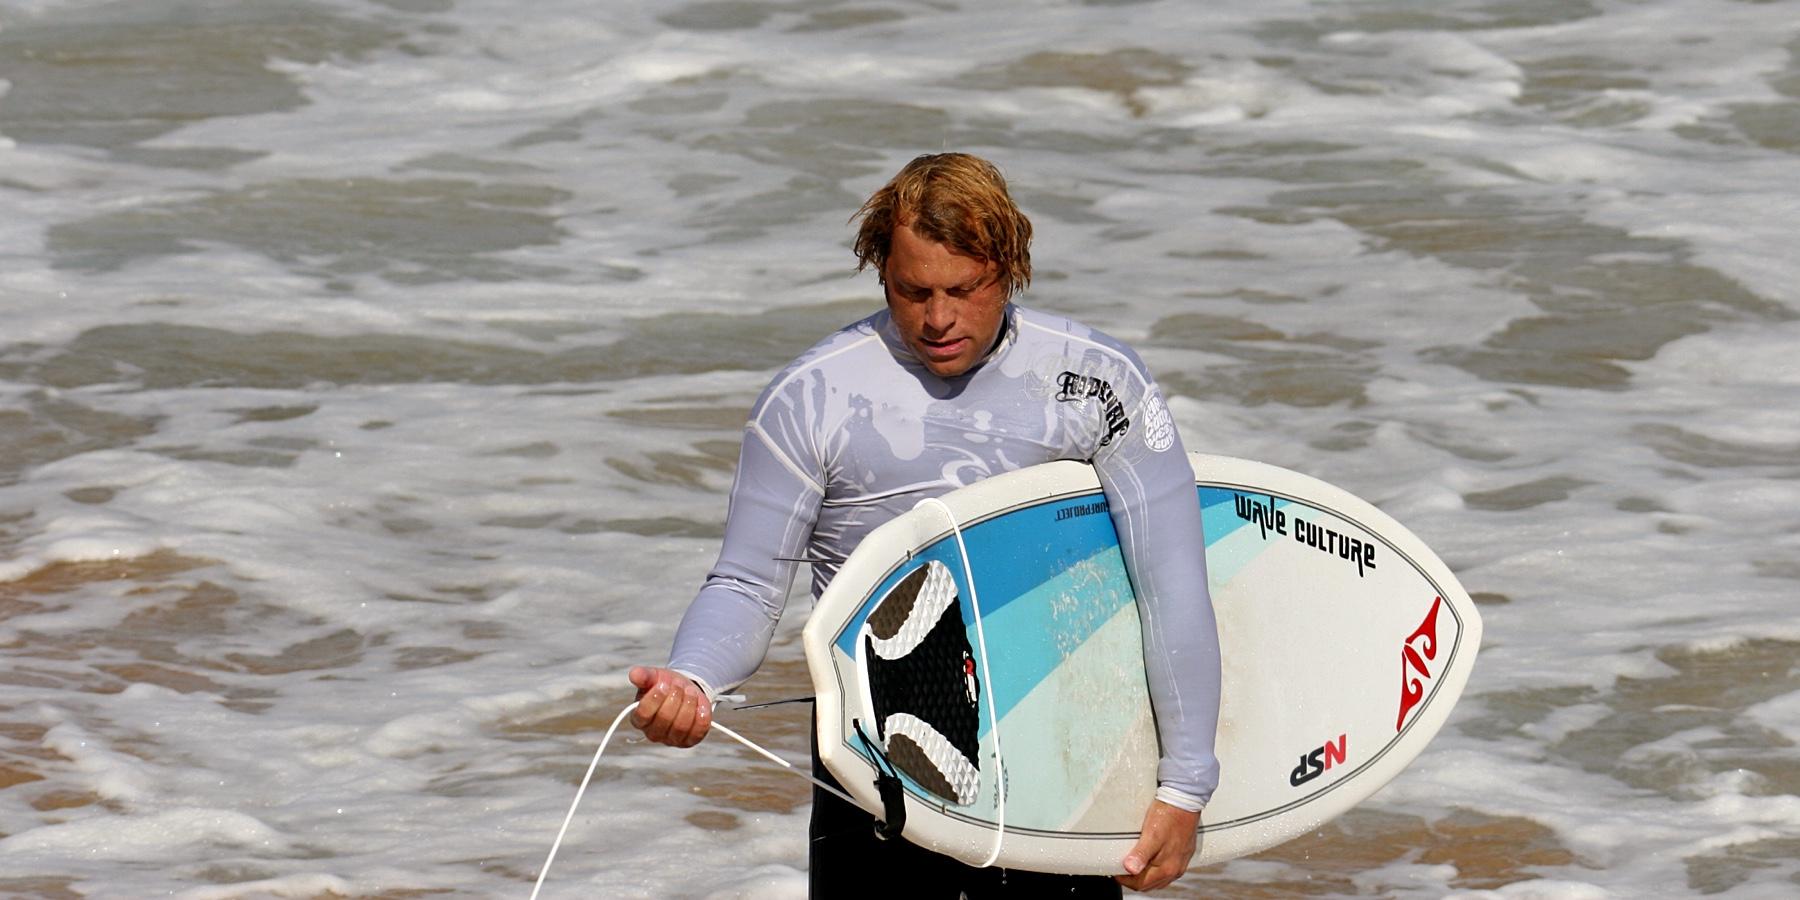 Surfbrett-Leash